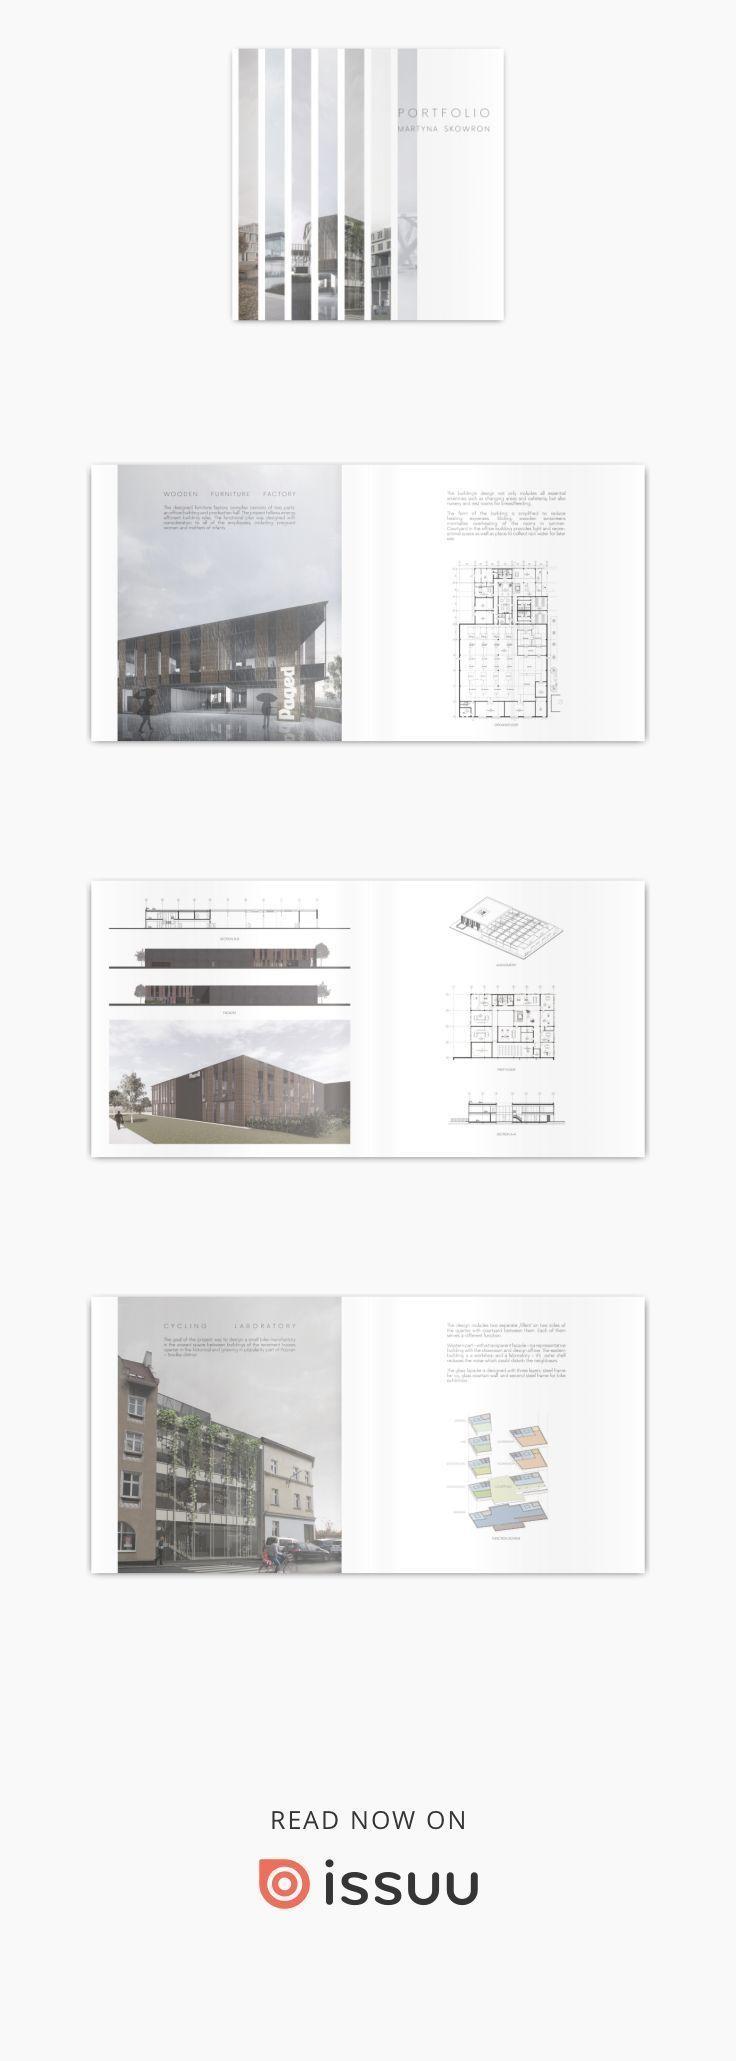 Portfolioarchitektur portfolioarchitektur   Architecture ...